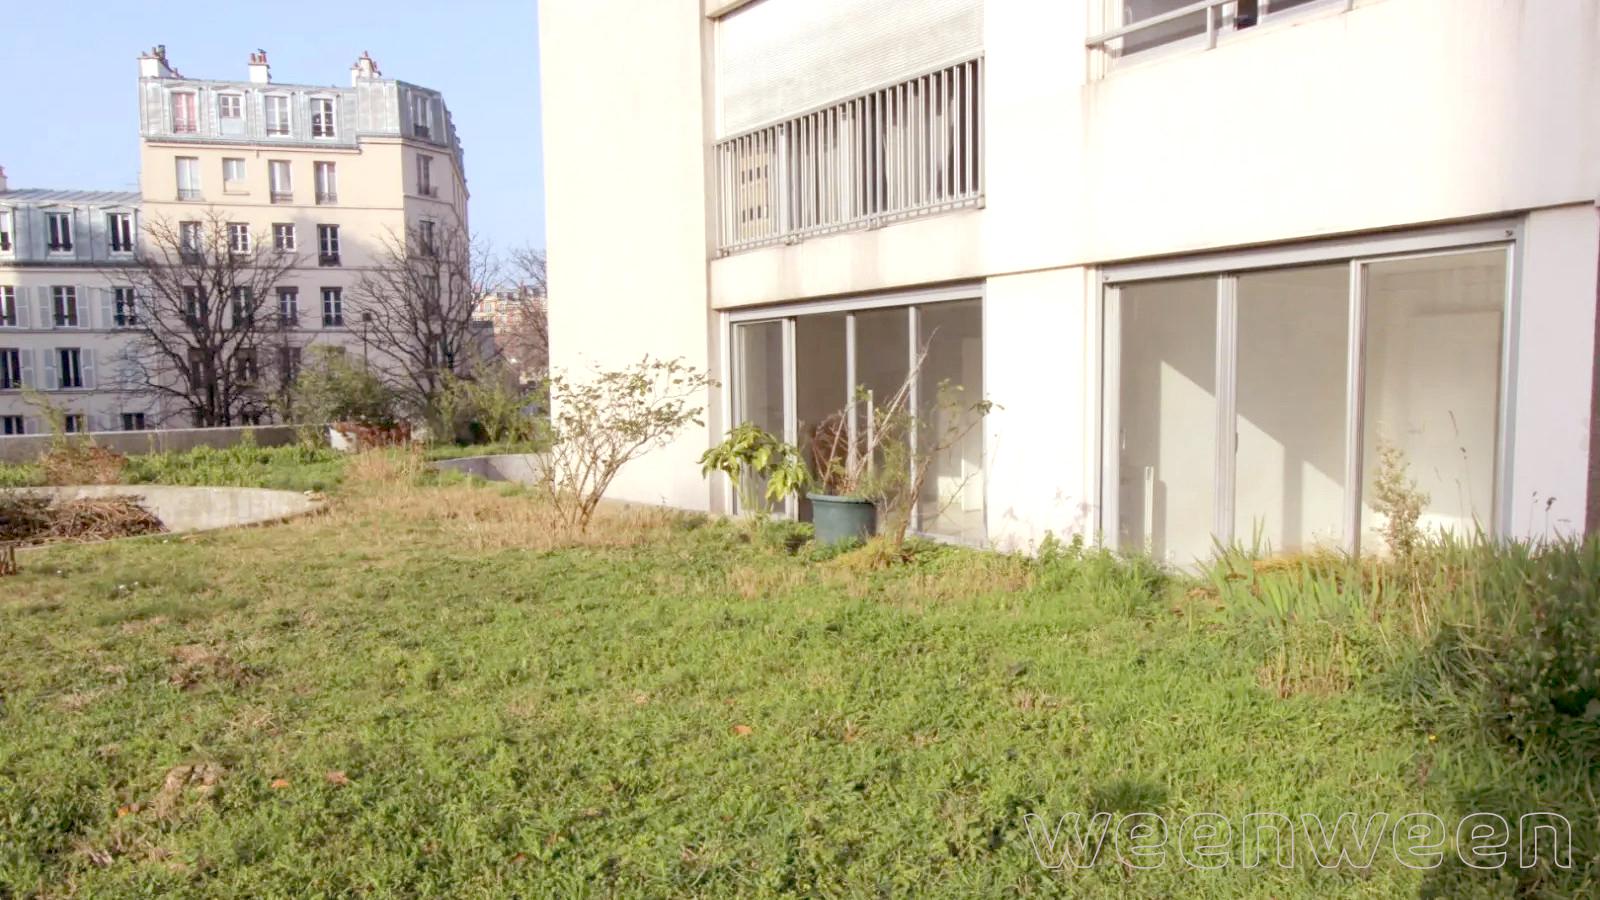 0012-11-jardin